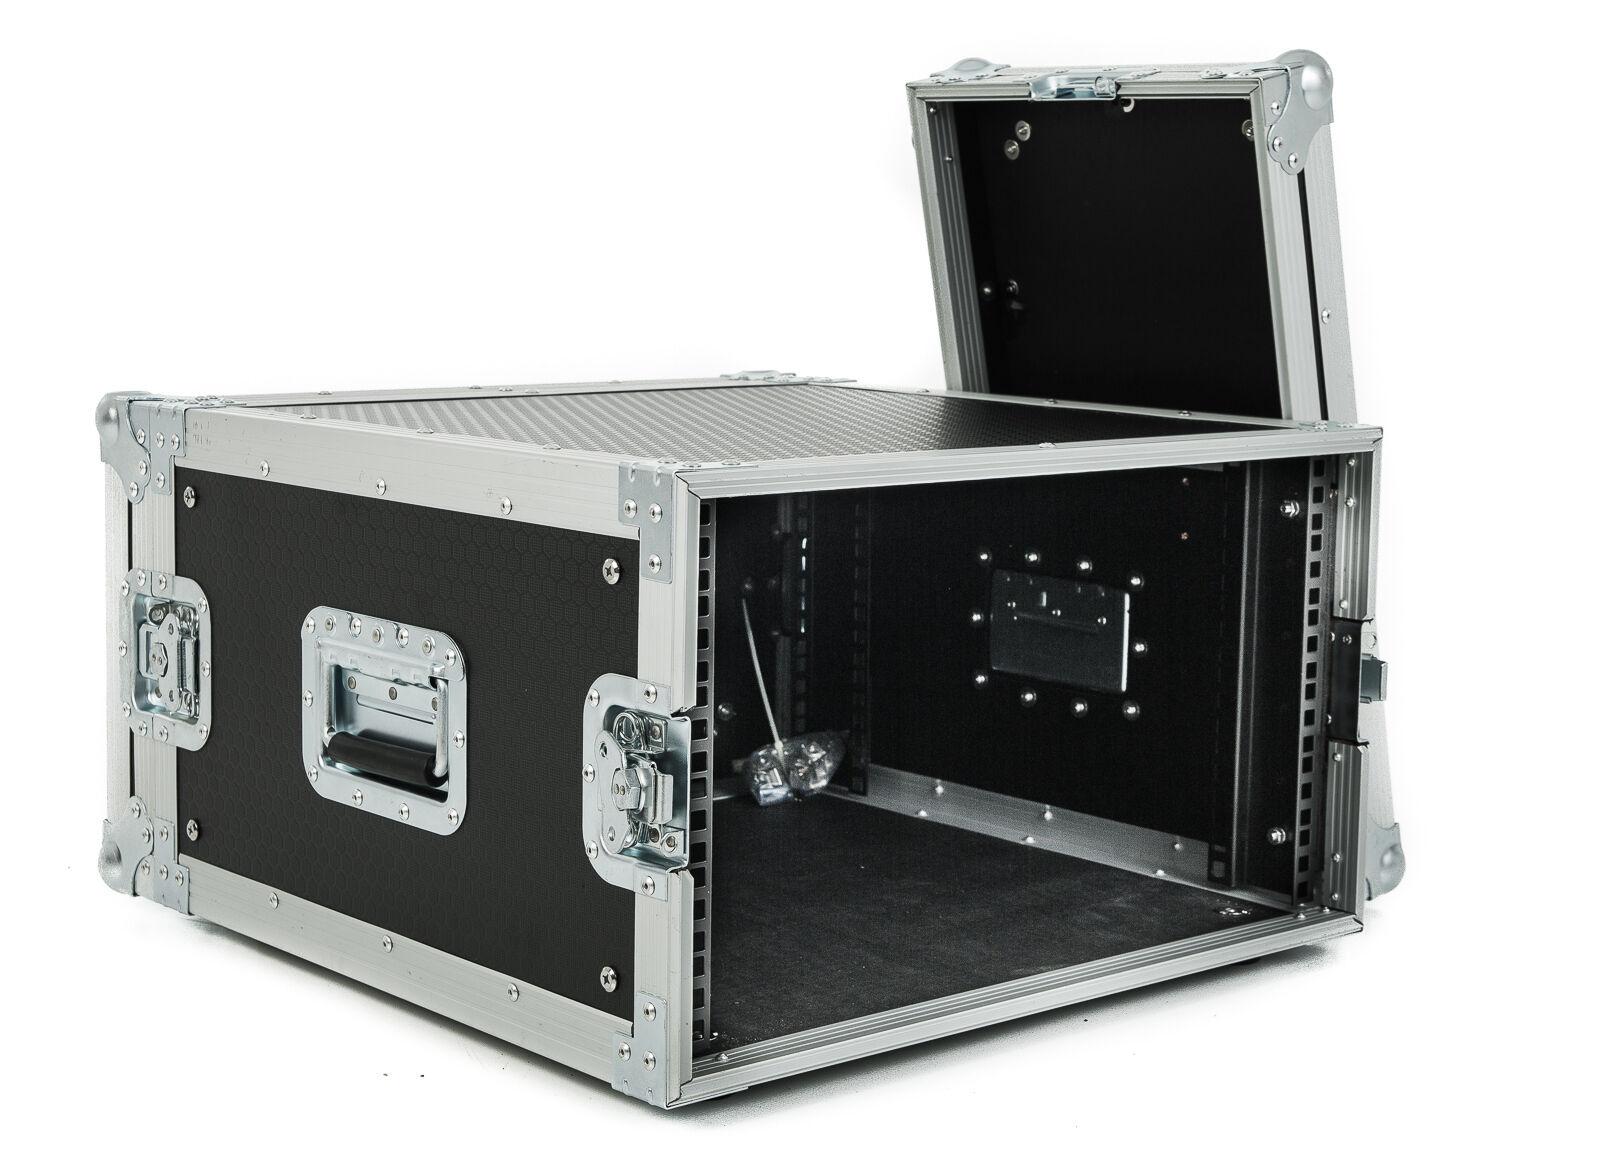 6u Shallow Rack Flight Case - 300mm Deep - Fast Shipping.